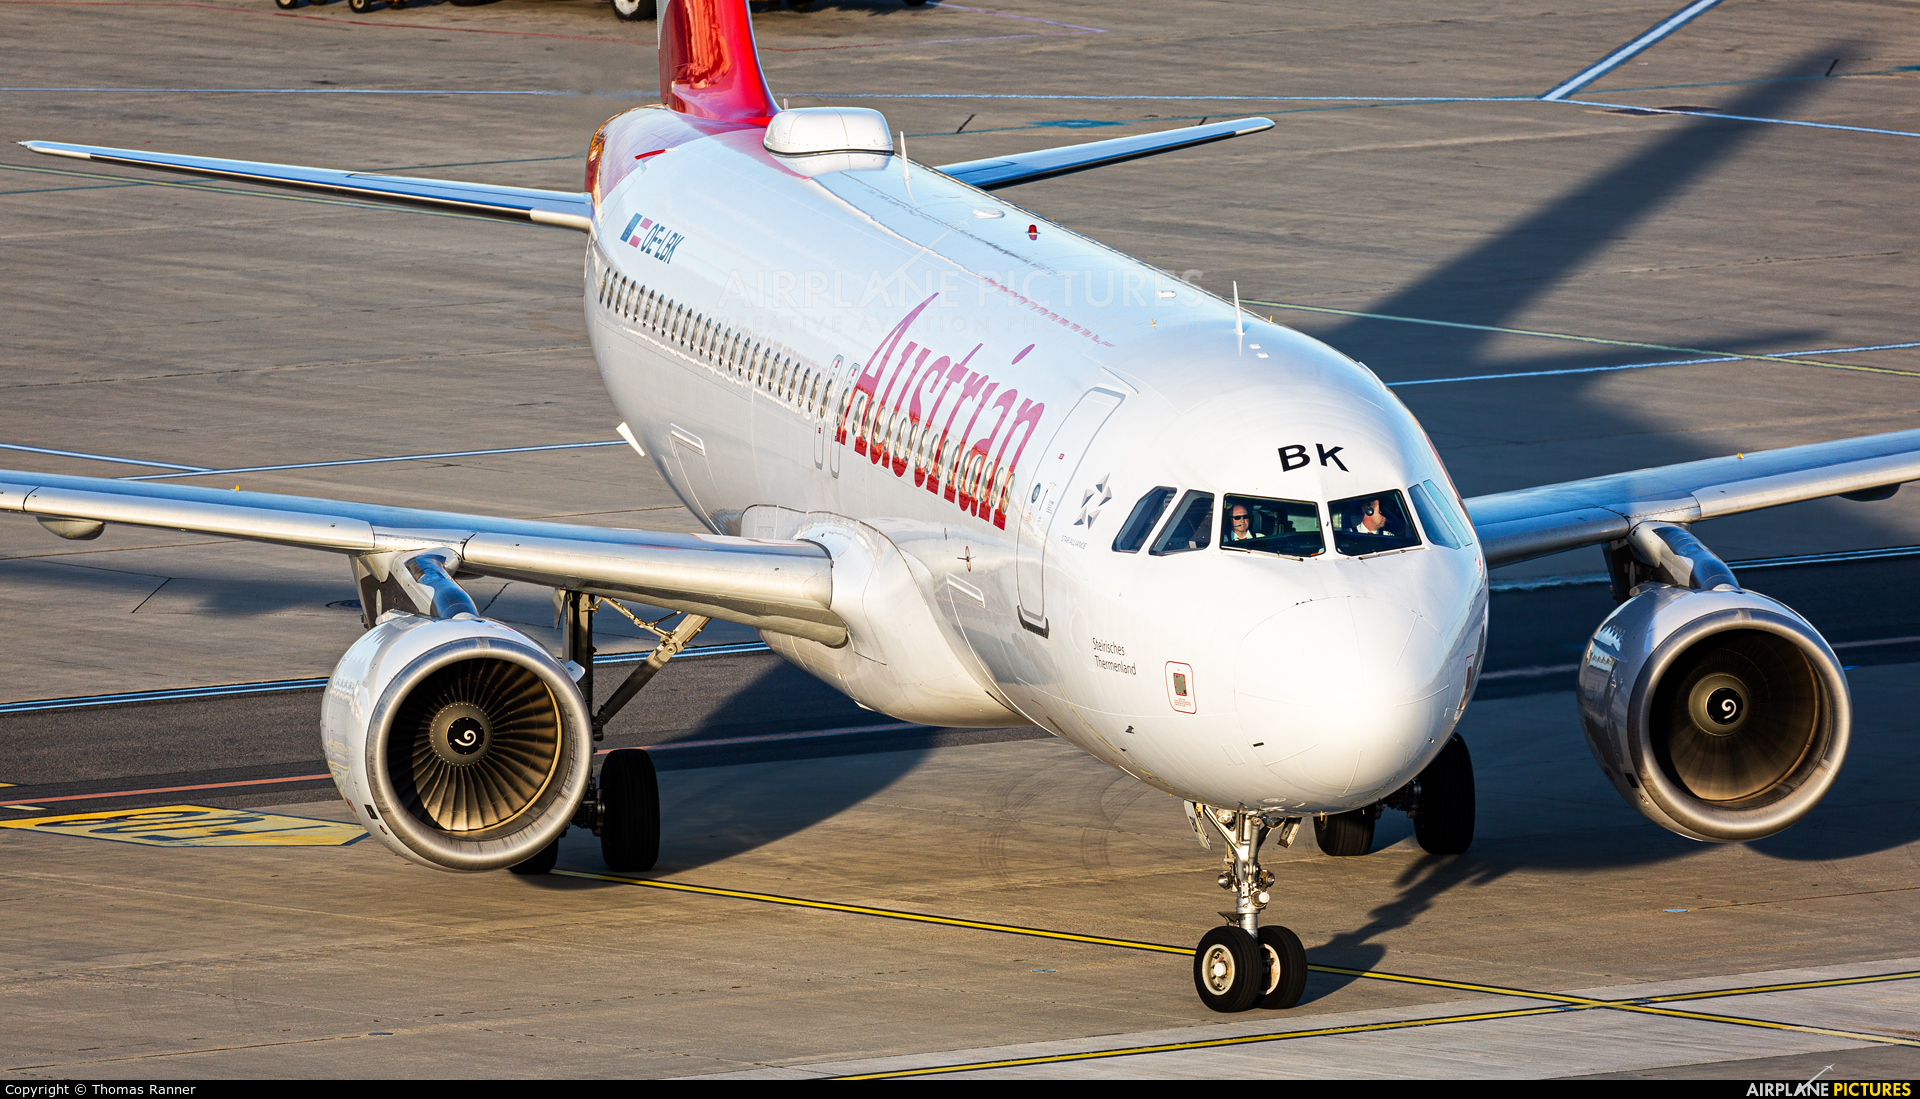 Austrian Airlines/Arrows/Tyrolean OE-LBK aircraft at Vienna - Schwechat